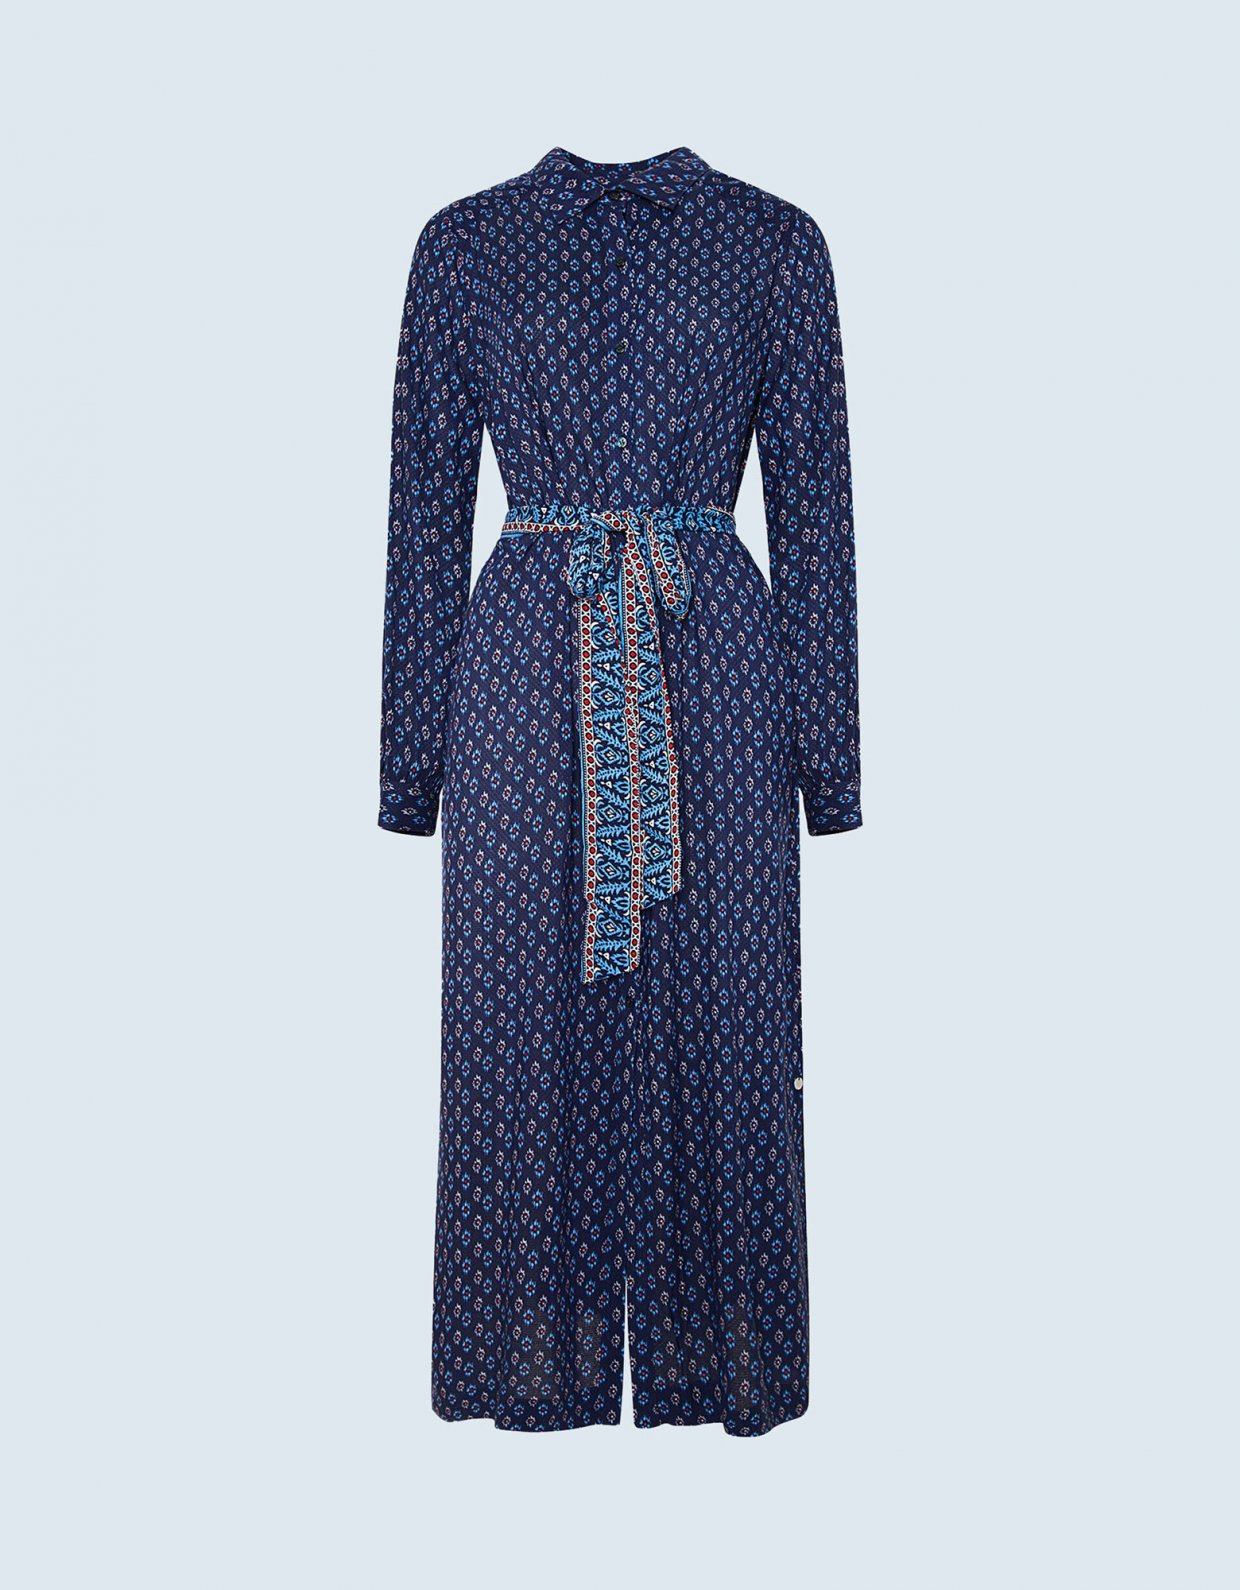 Pepe Jeans Nina dress